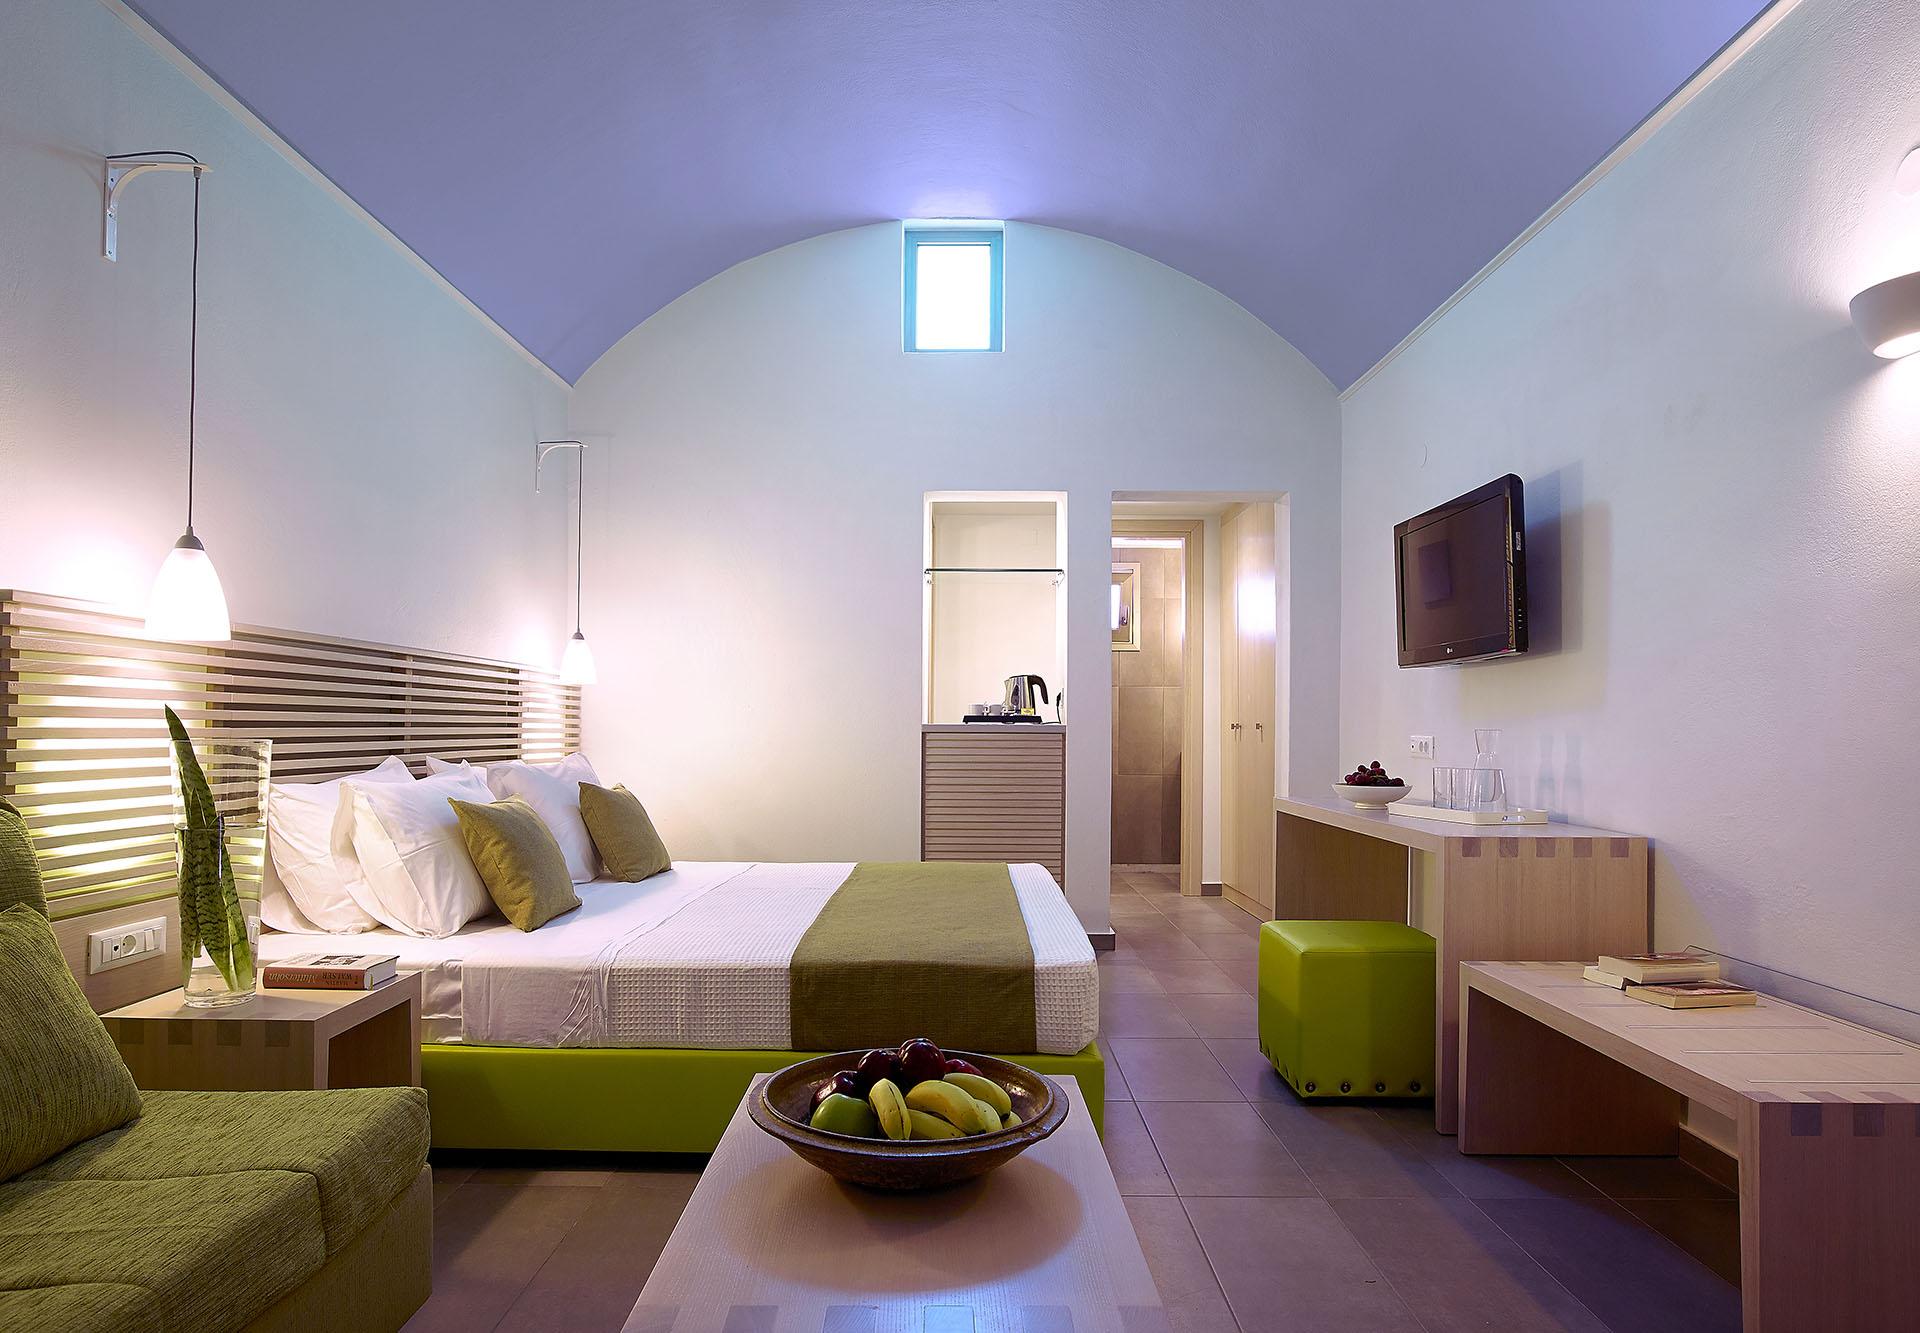 bungalows in crete | Kakos Bay Hotel | Ierapetra, Crete, Greece